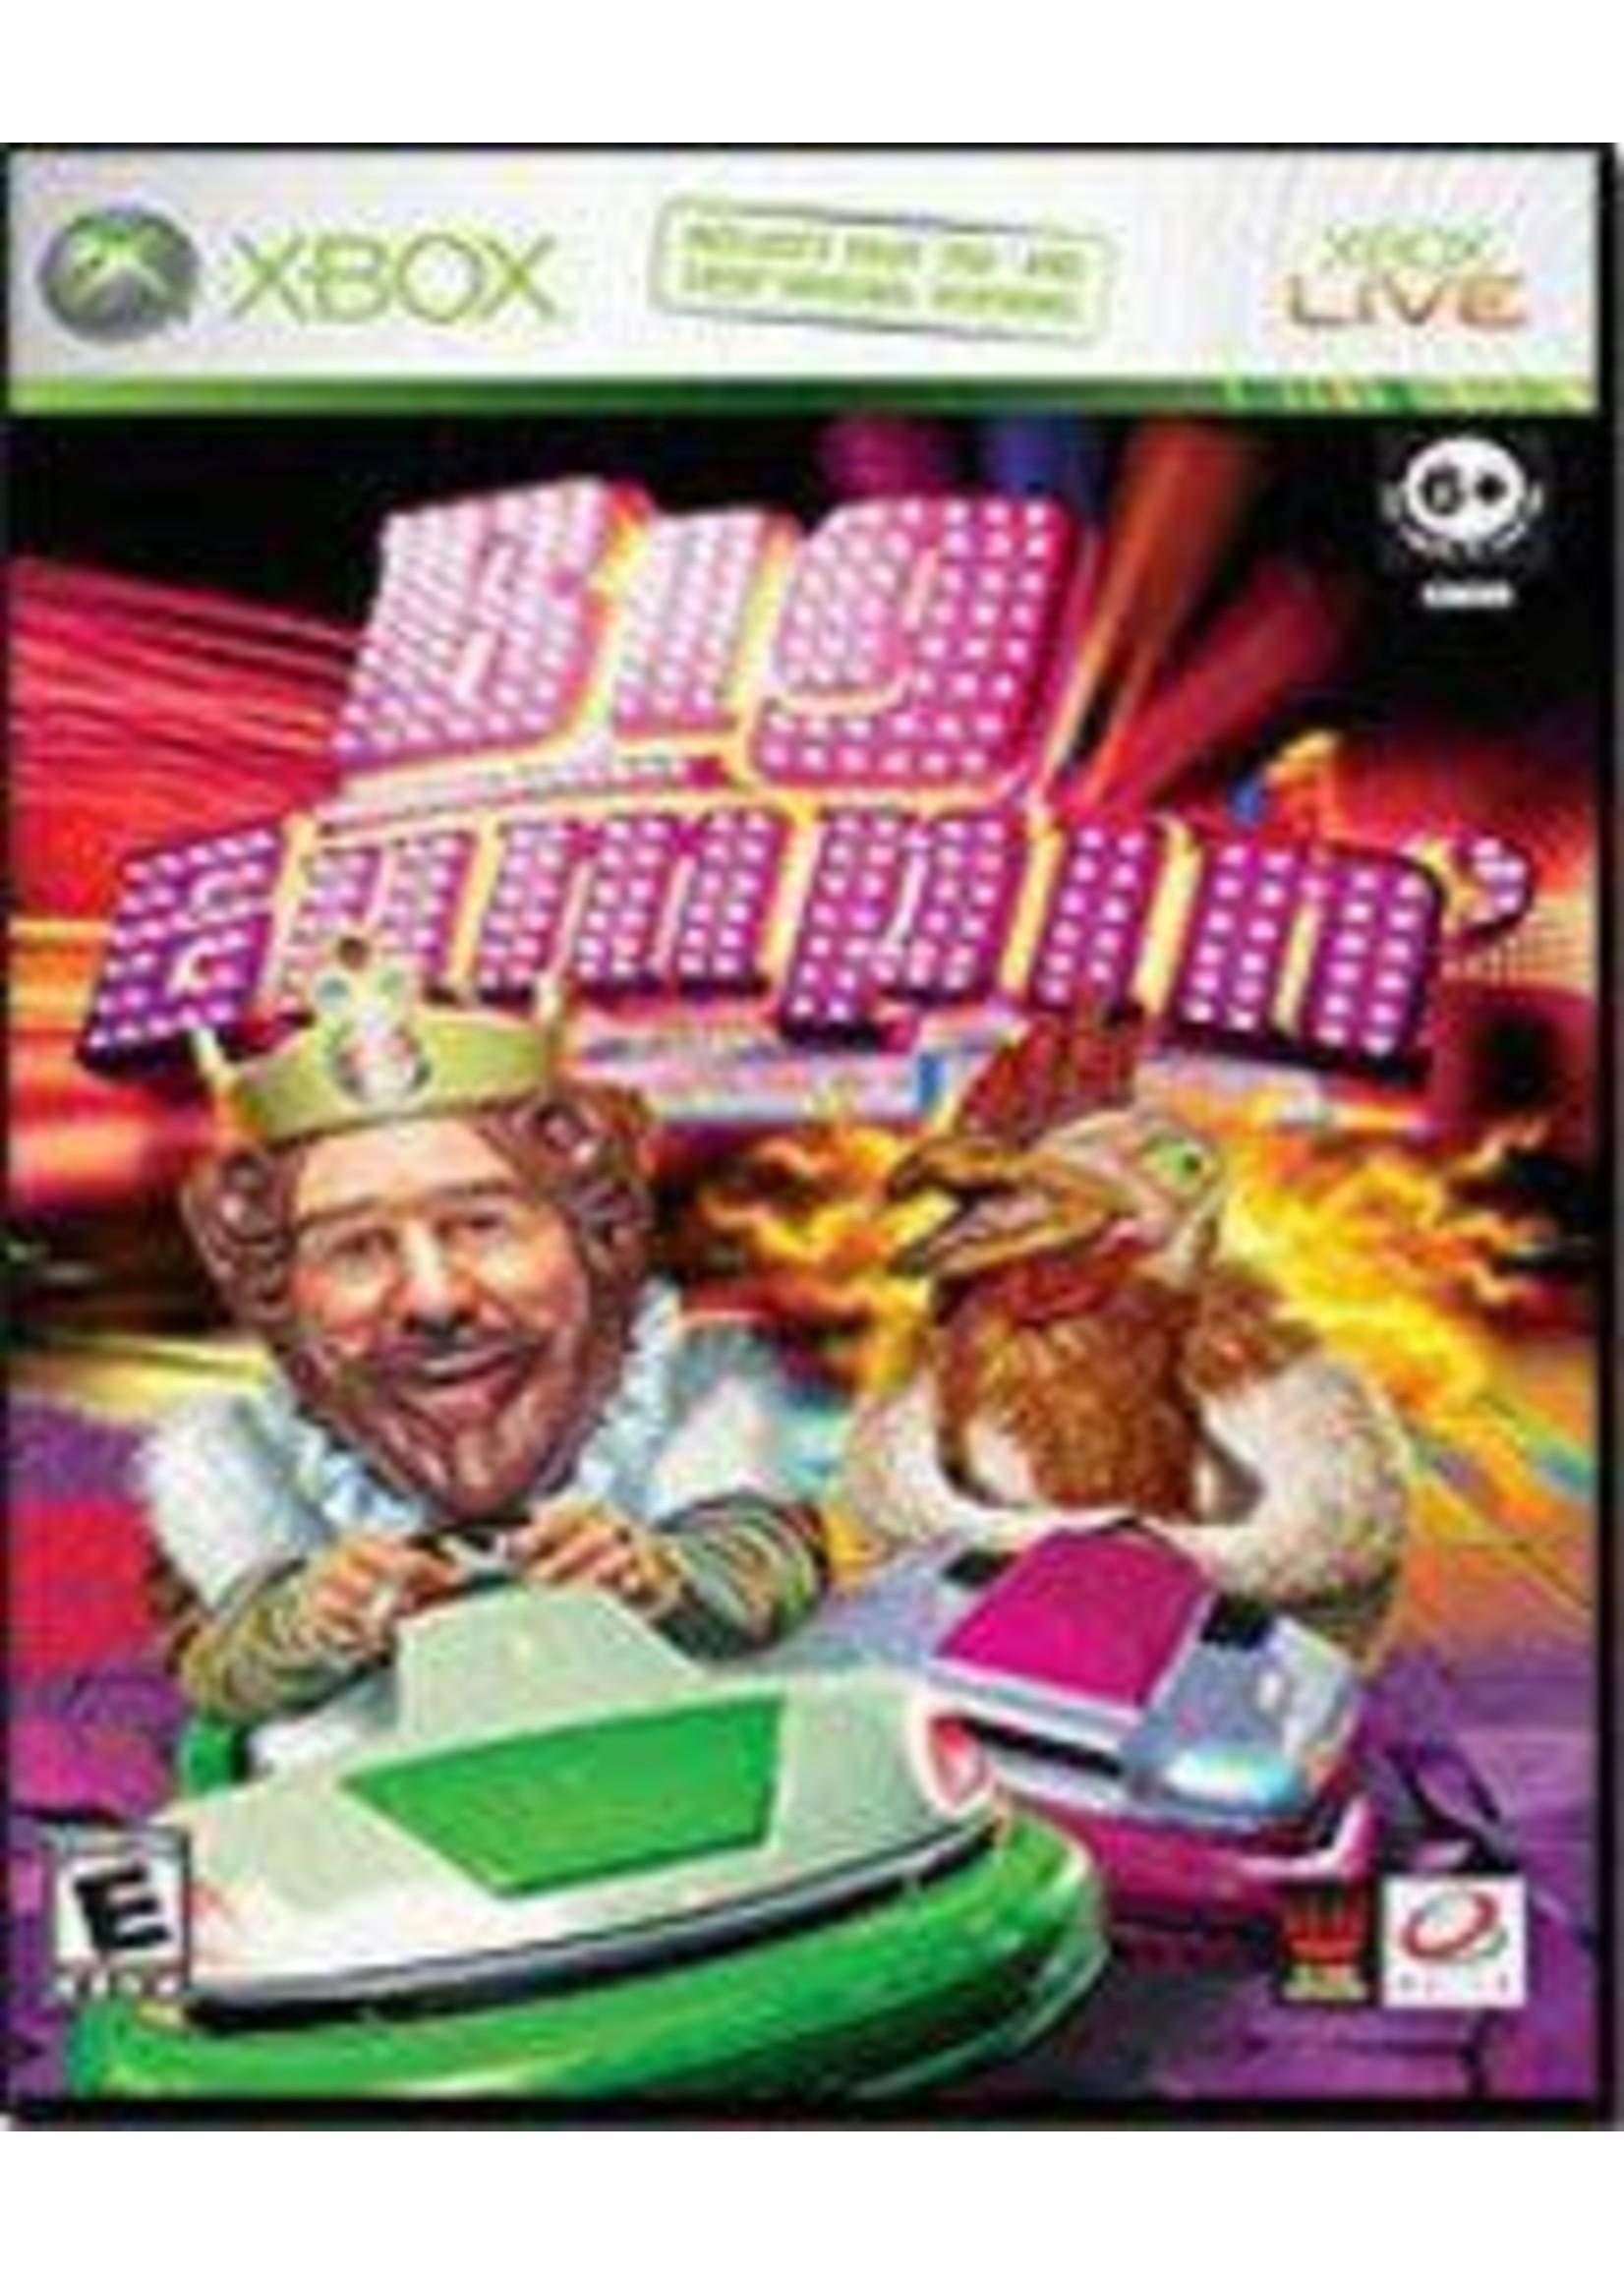 Big Bumpin' Xbox 360